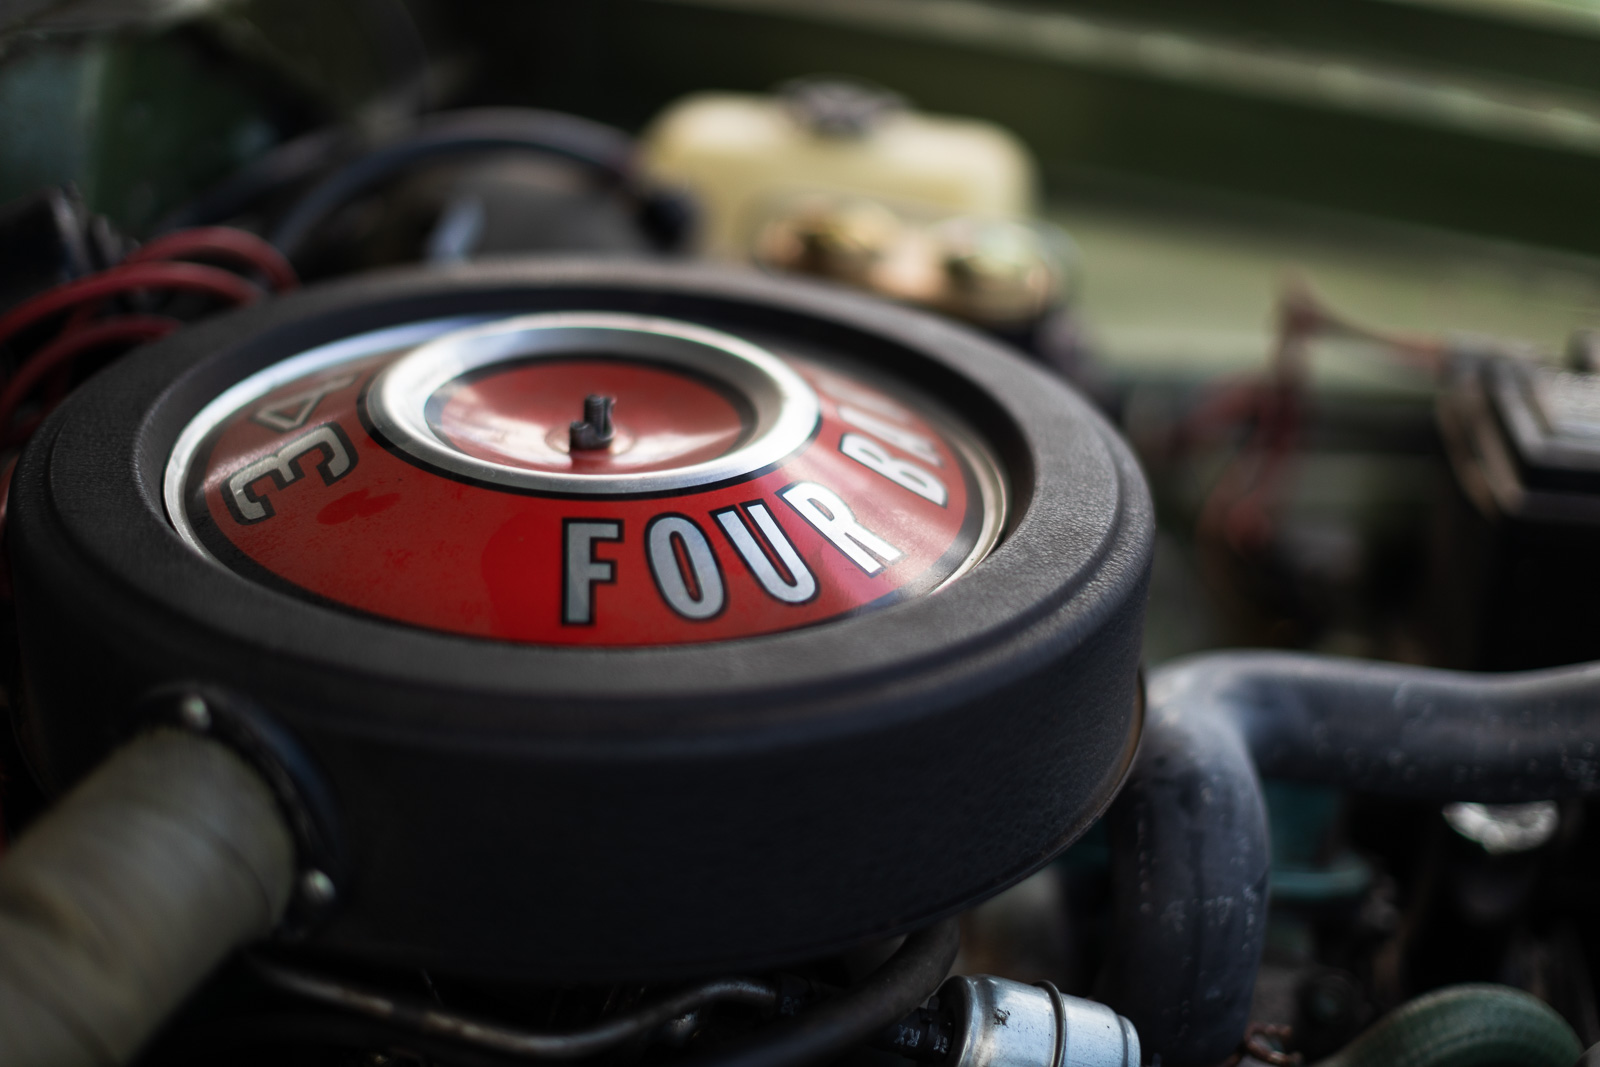 fat-guys-car-show-blog-51.jpg